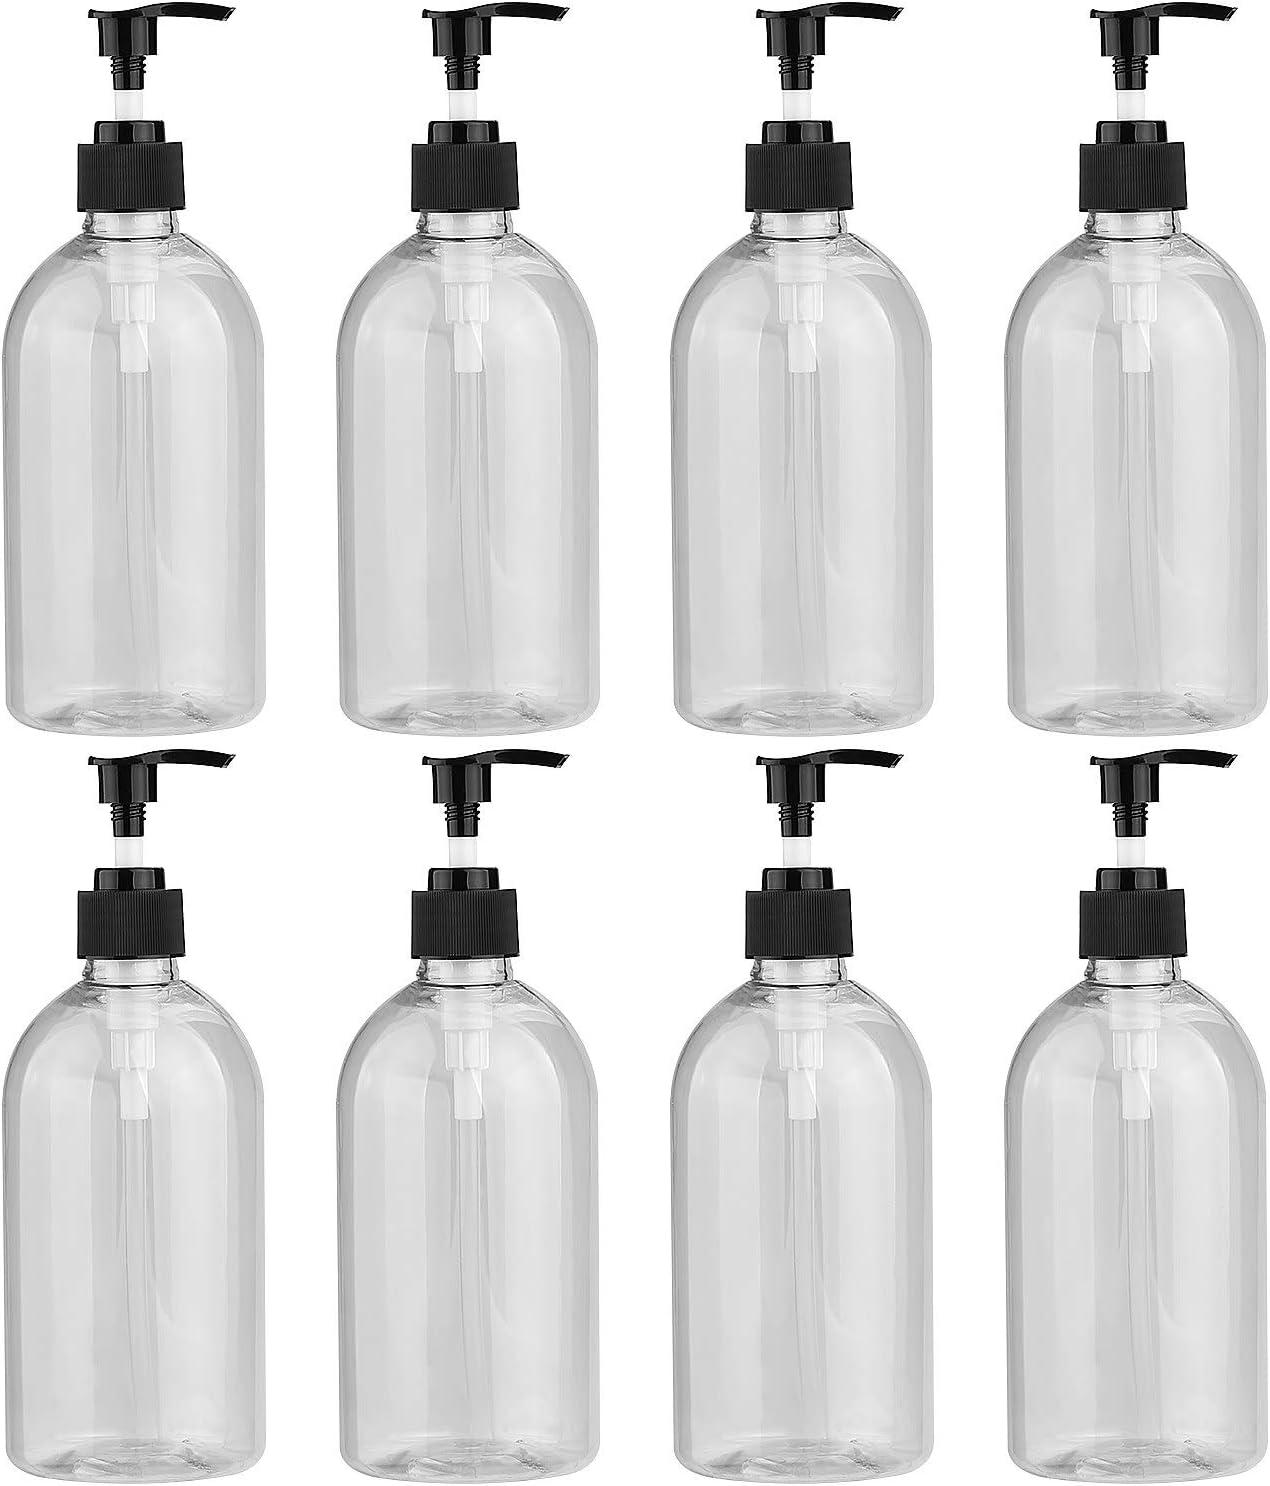 AConnet 8 Pack Plastic Pump Bottle Dispenser, 17oz / 500ml Clear Hand Soap Dispenser Bottle with Pump, Liquid Lotion Essential Oil Shampoos Dispensing Bottles, BPA-Free PET Refillable Containers